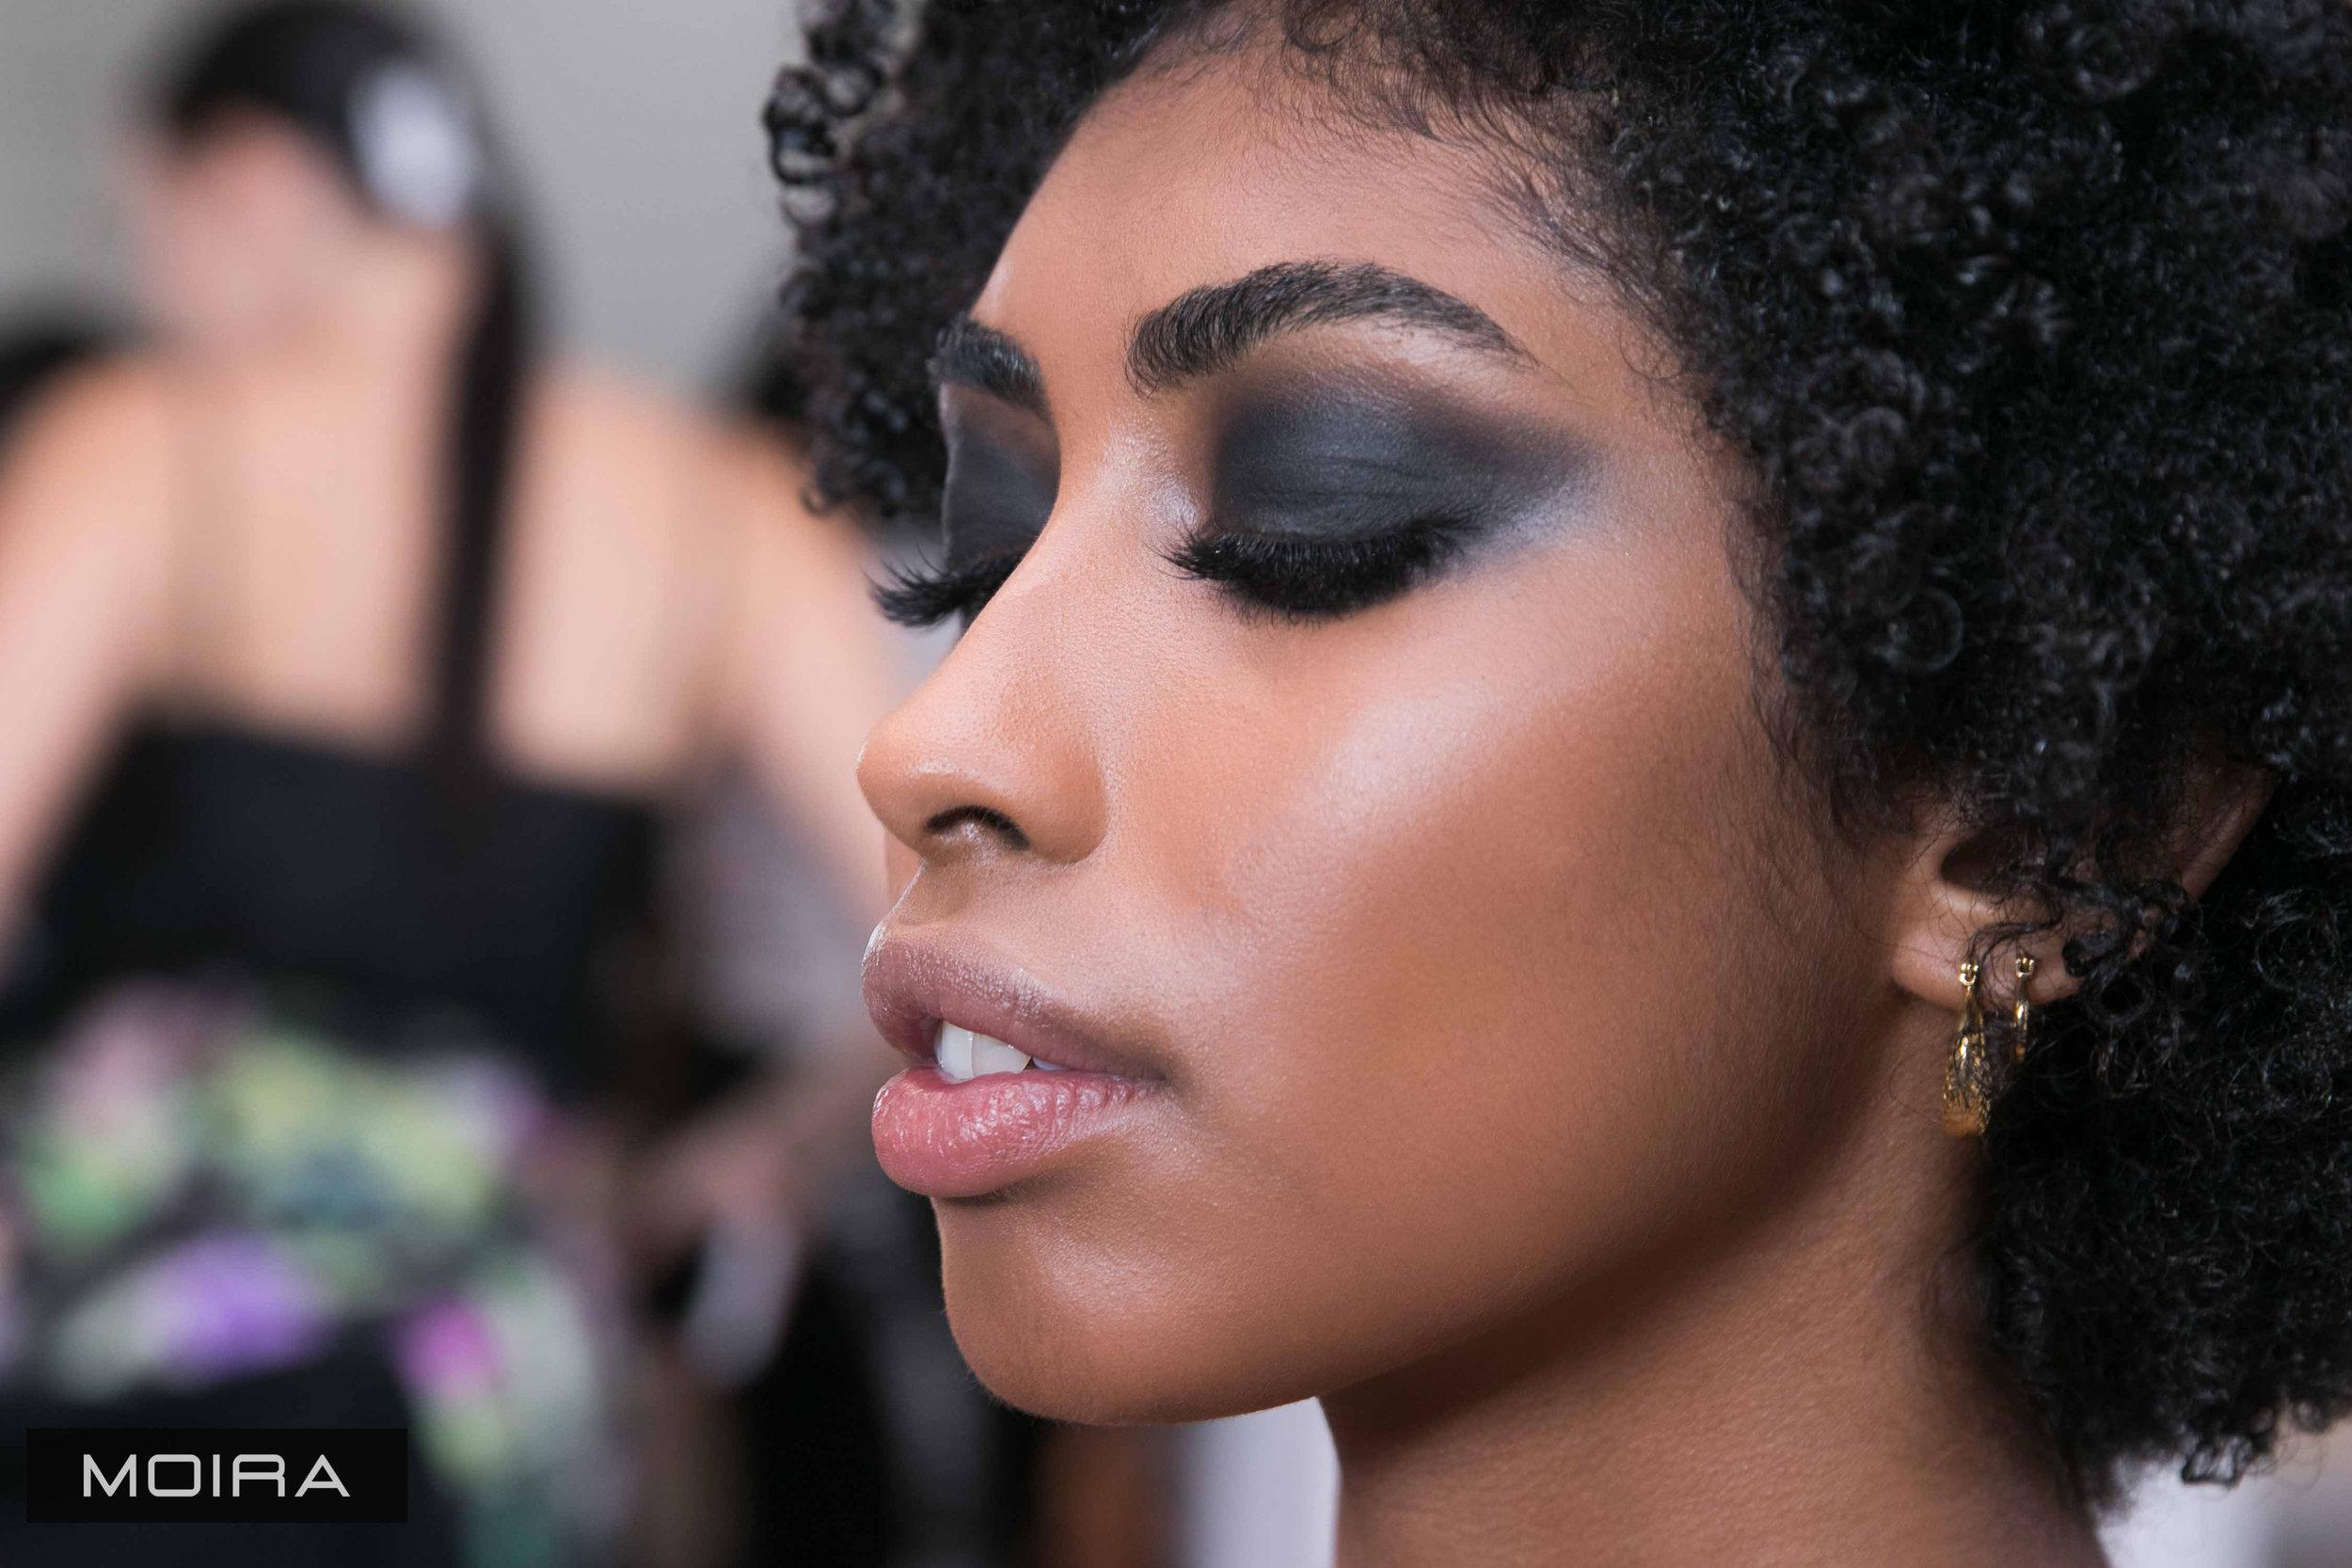 MOIRA_Cosmetics_New_York_Fashion_Week_2018-13.jpg